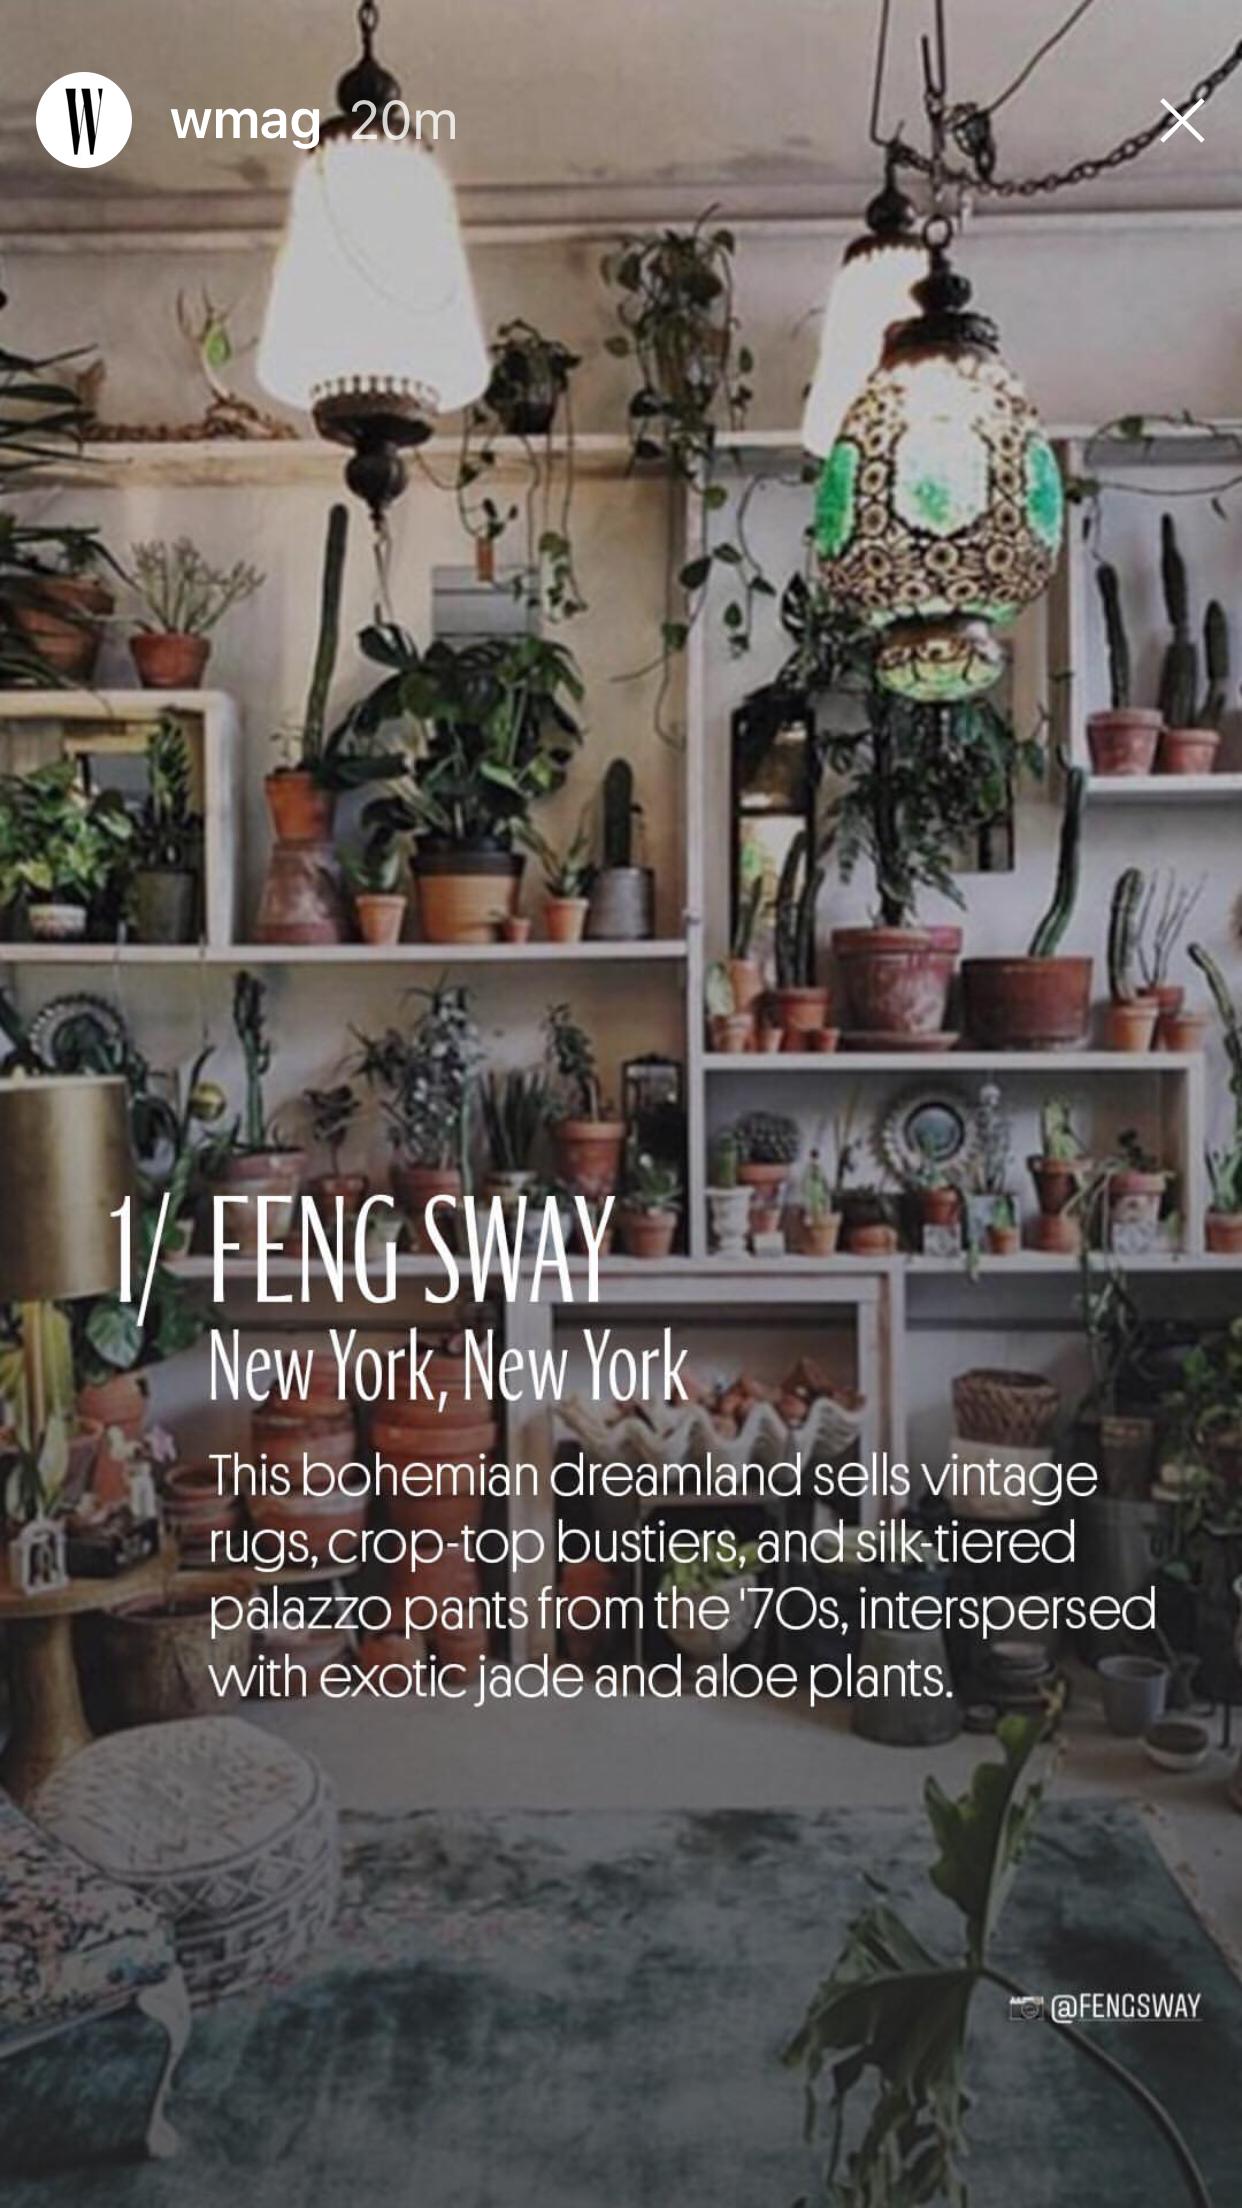 W MAGAZINE  #1 FENG SWAY